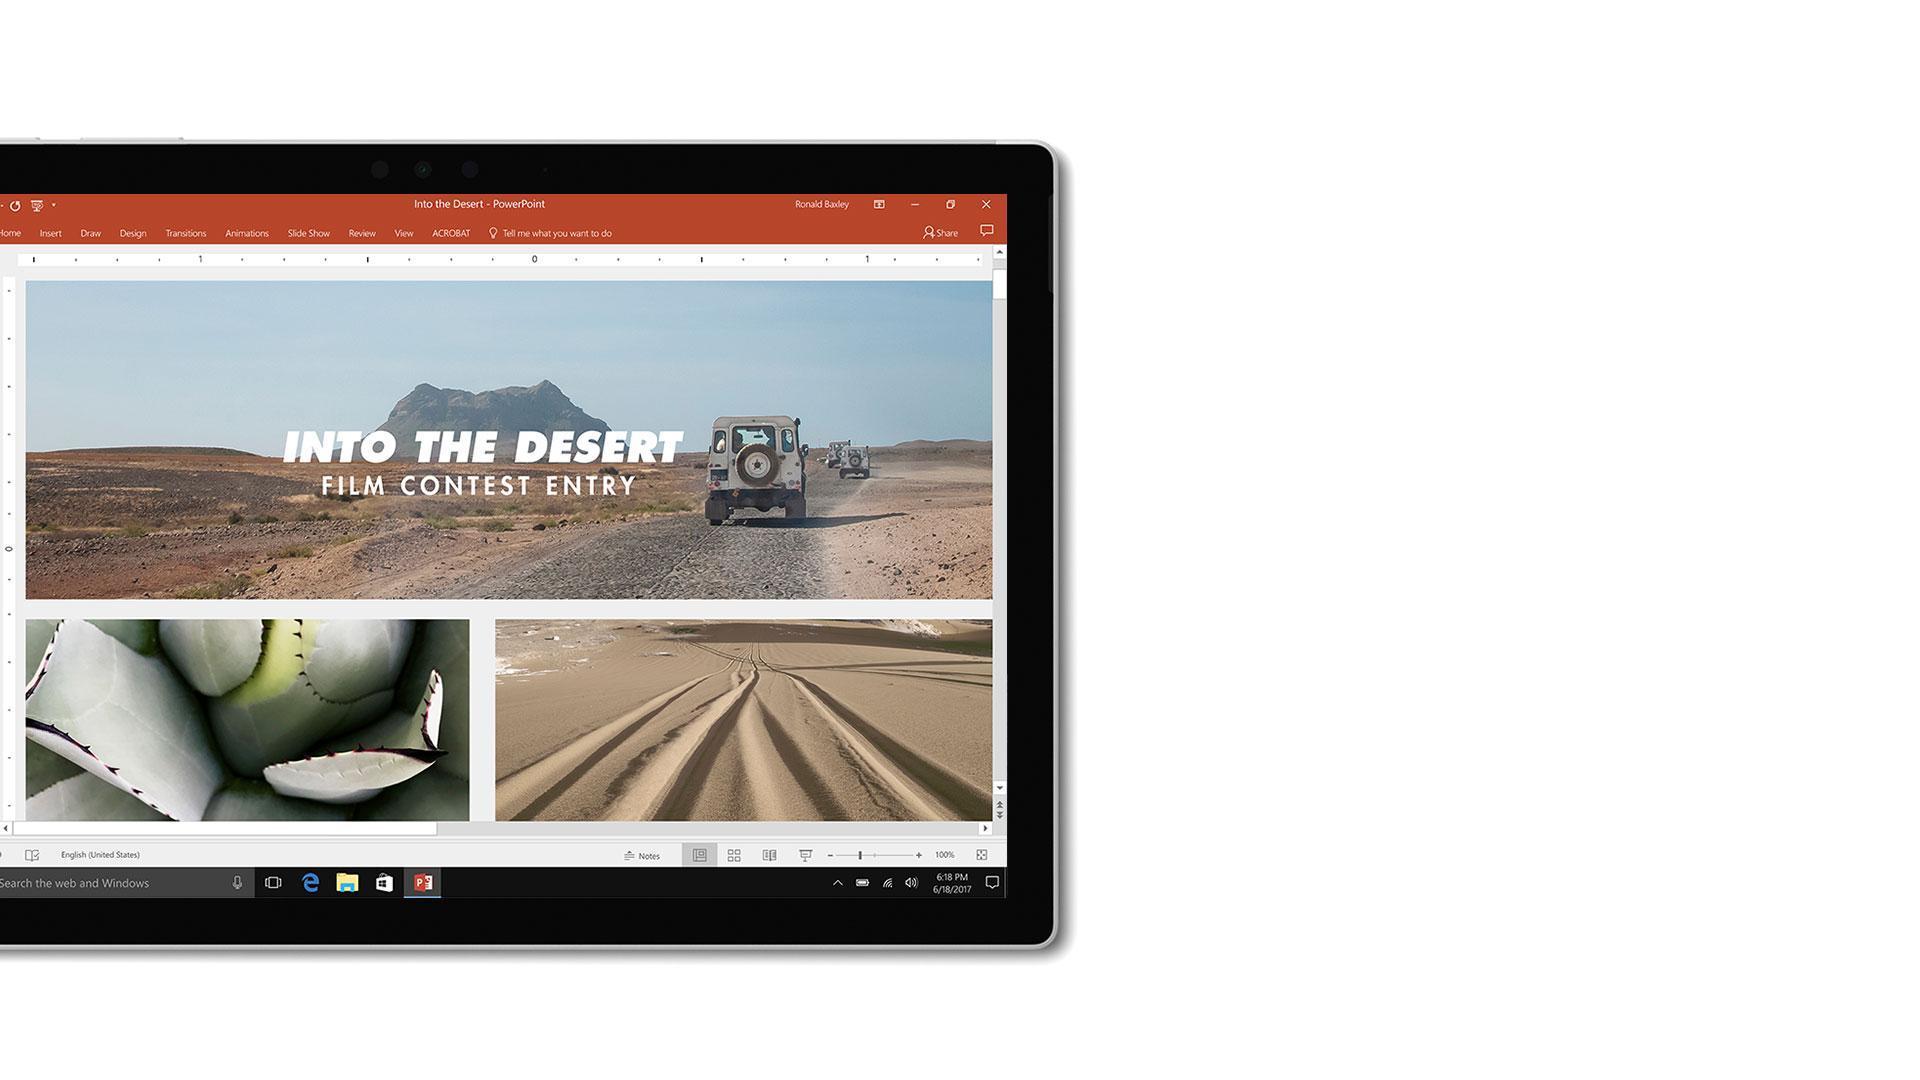 Microsoft Powerpoint のユーザー インターフェイスの画像